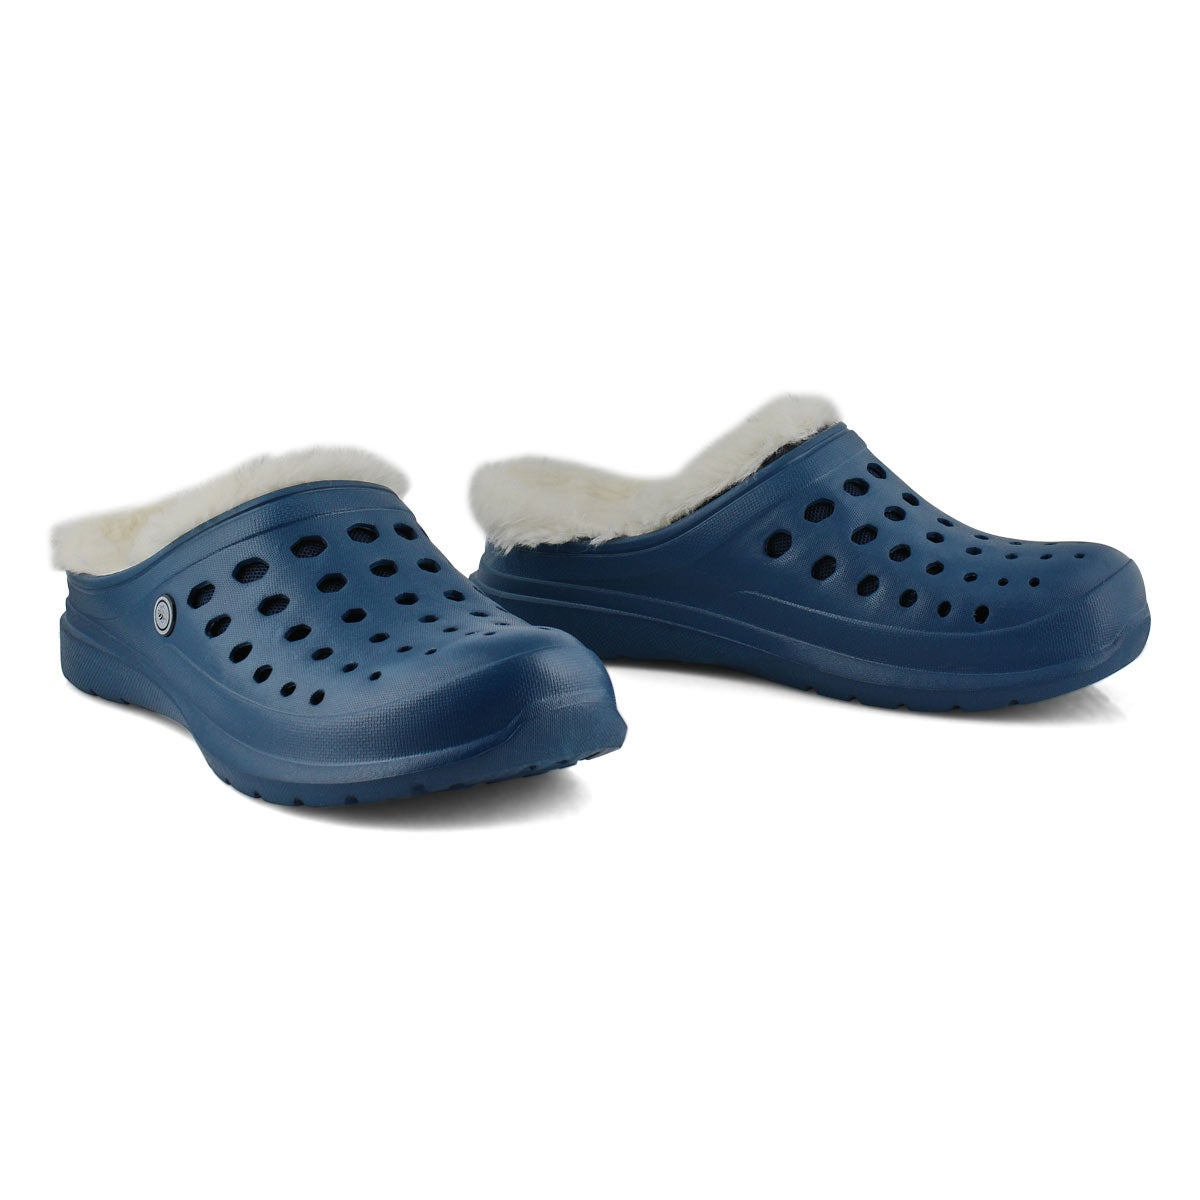 Unisex Uaslp Comfort Clog - Navy/ Natural